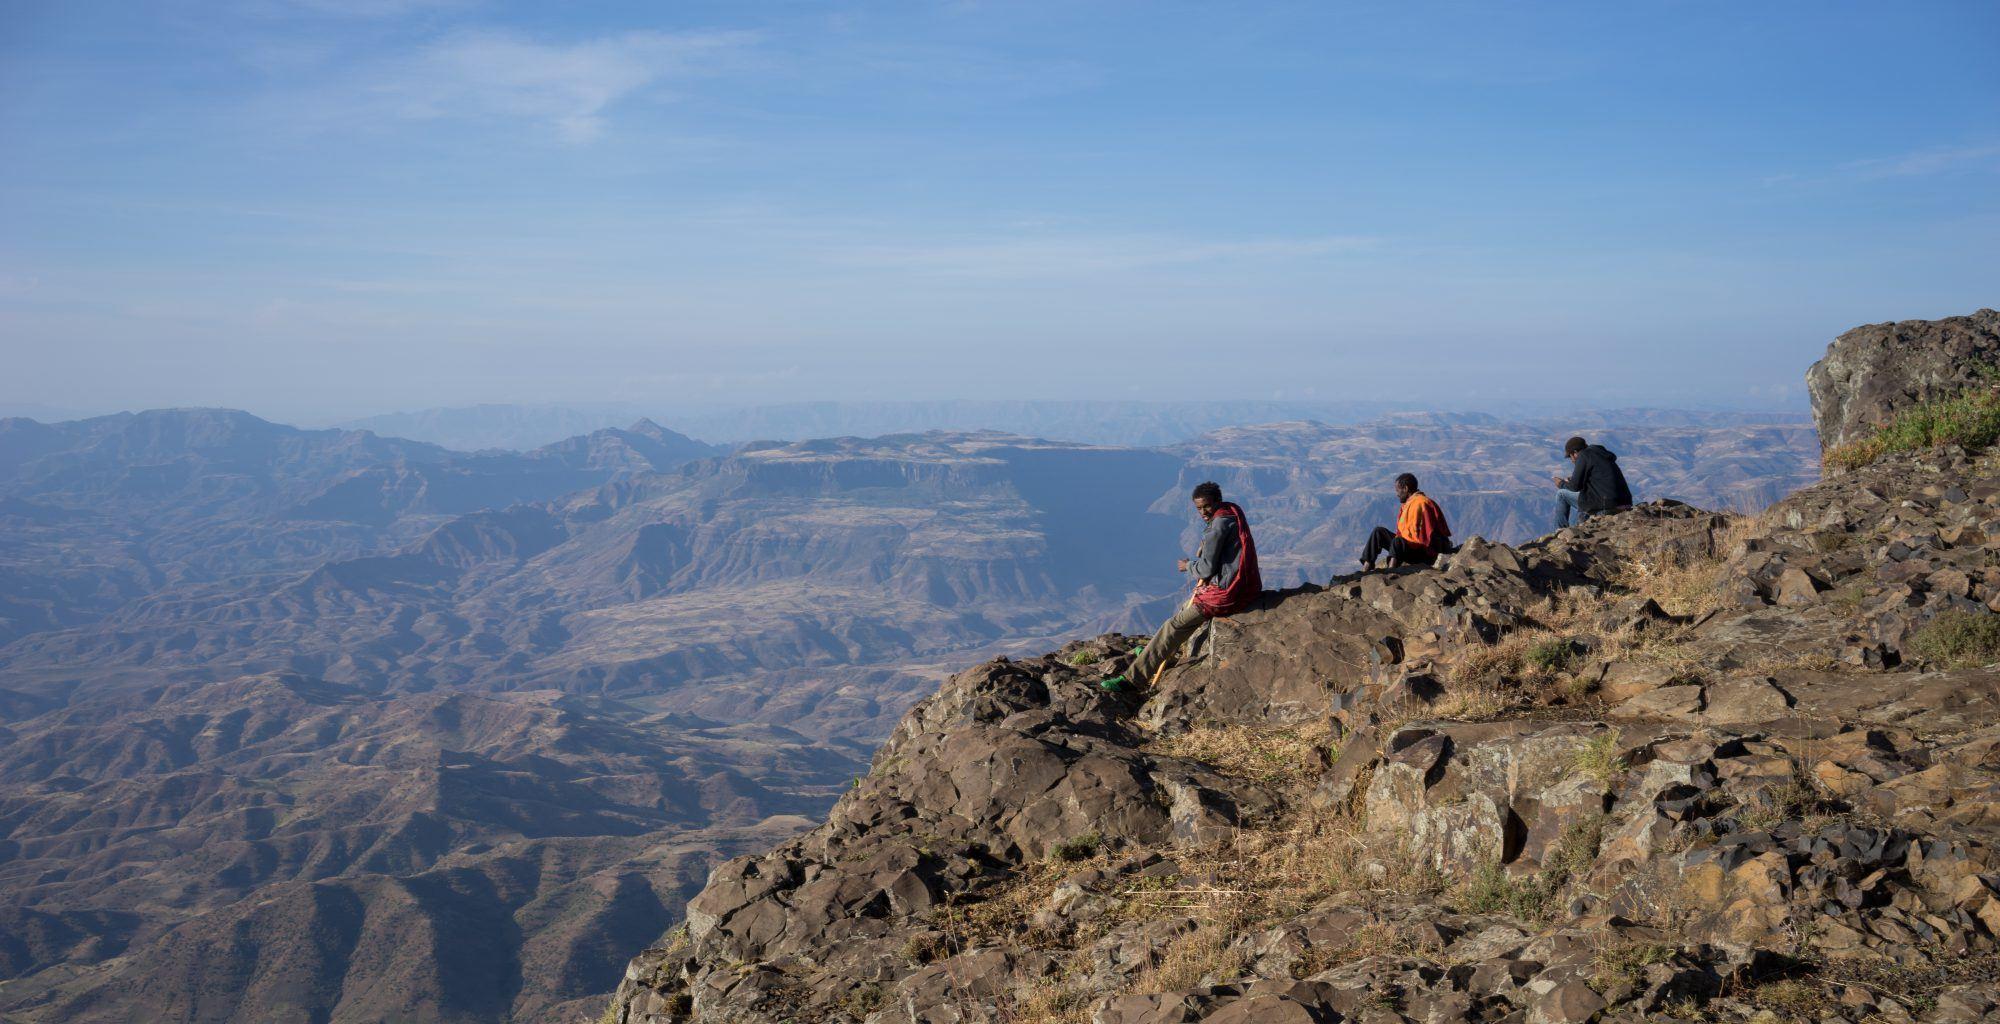 Ethiopia-Tukul-Village-Clifftop